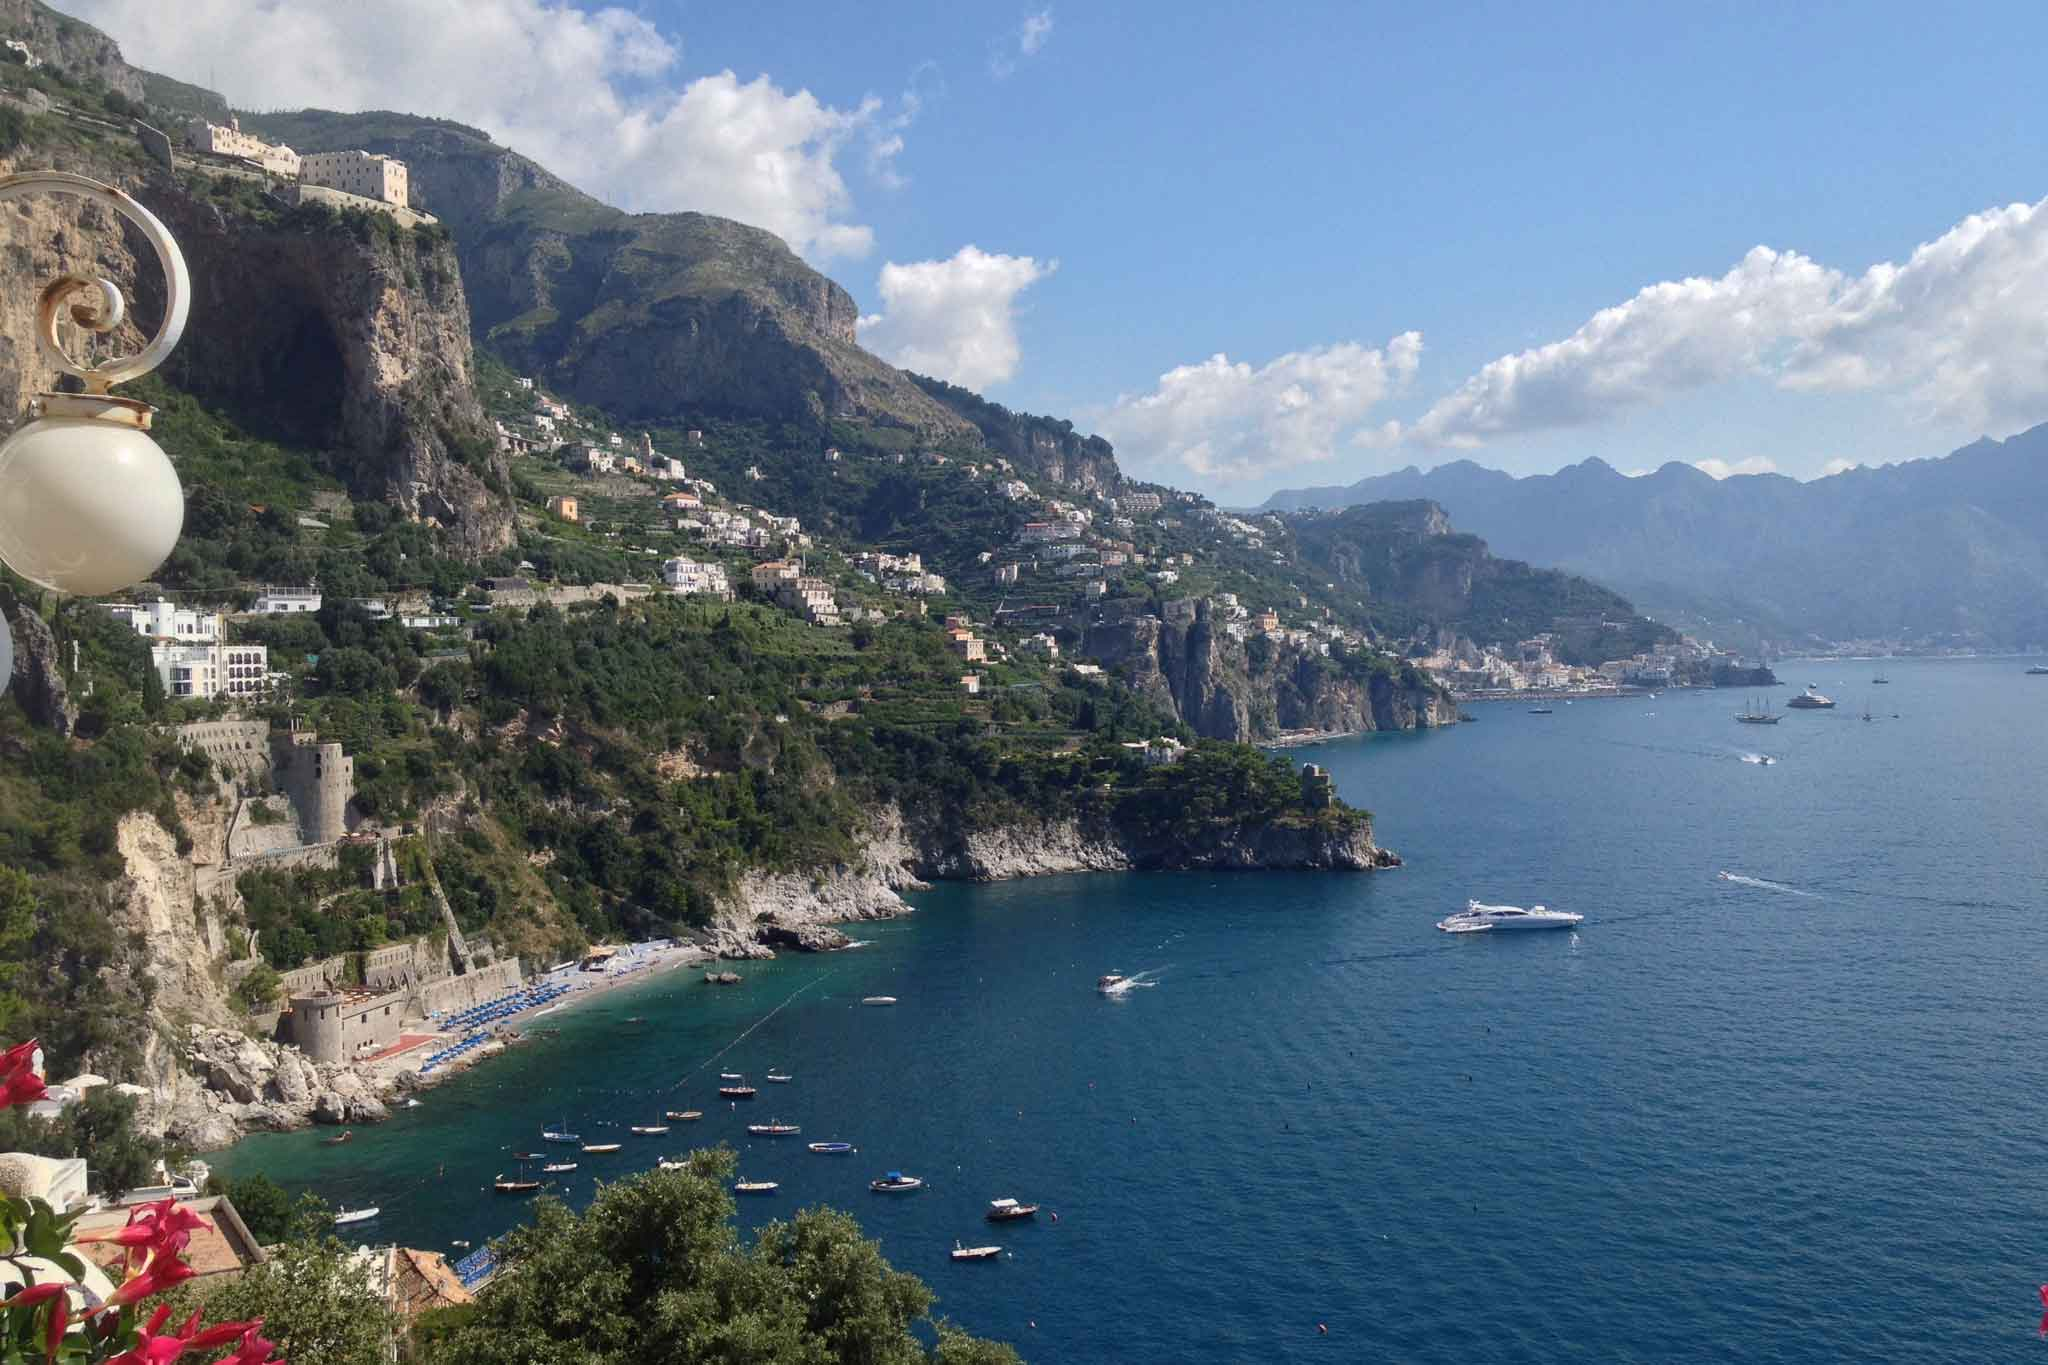 Costiera Amalfitana Conca dei Marini